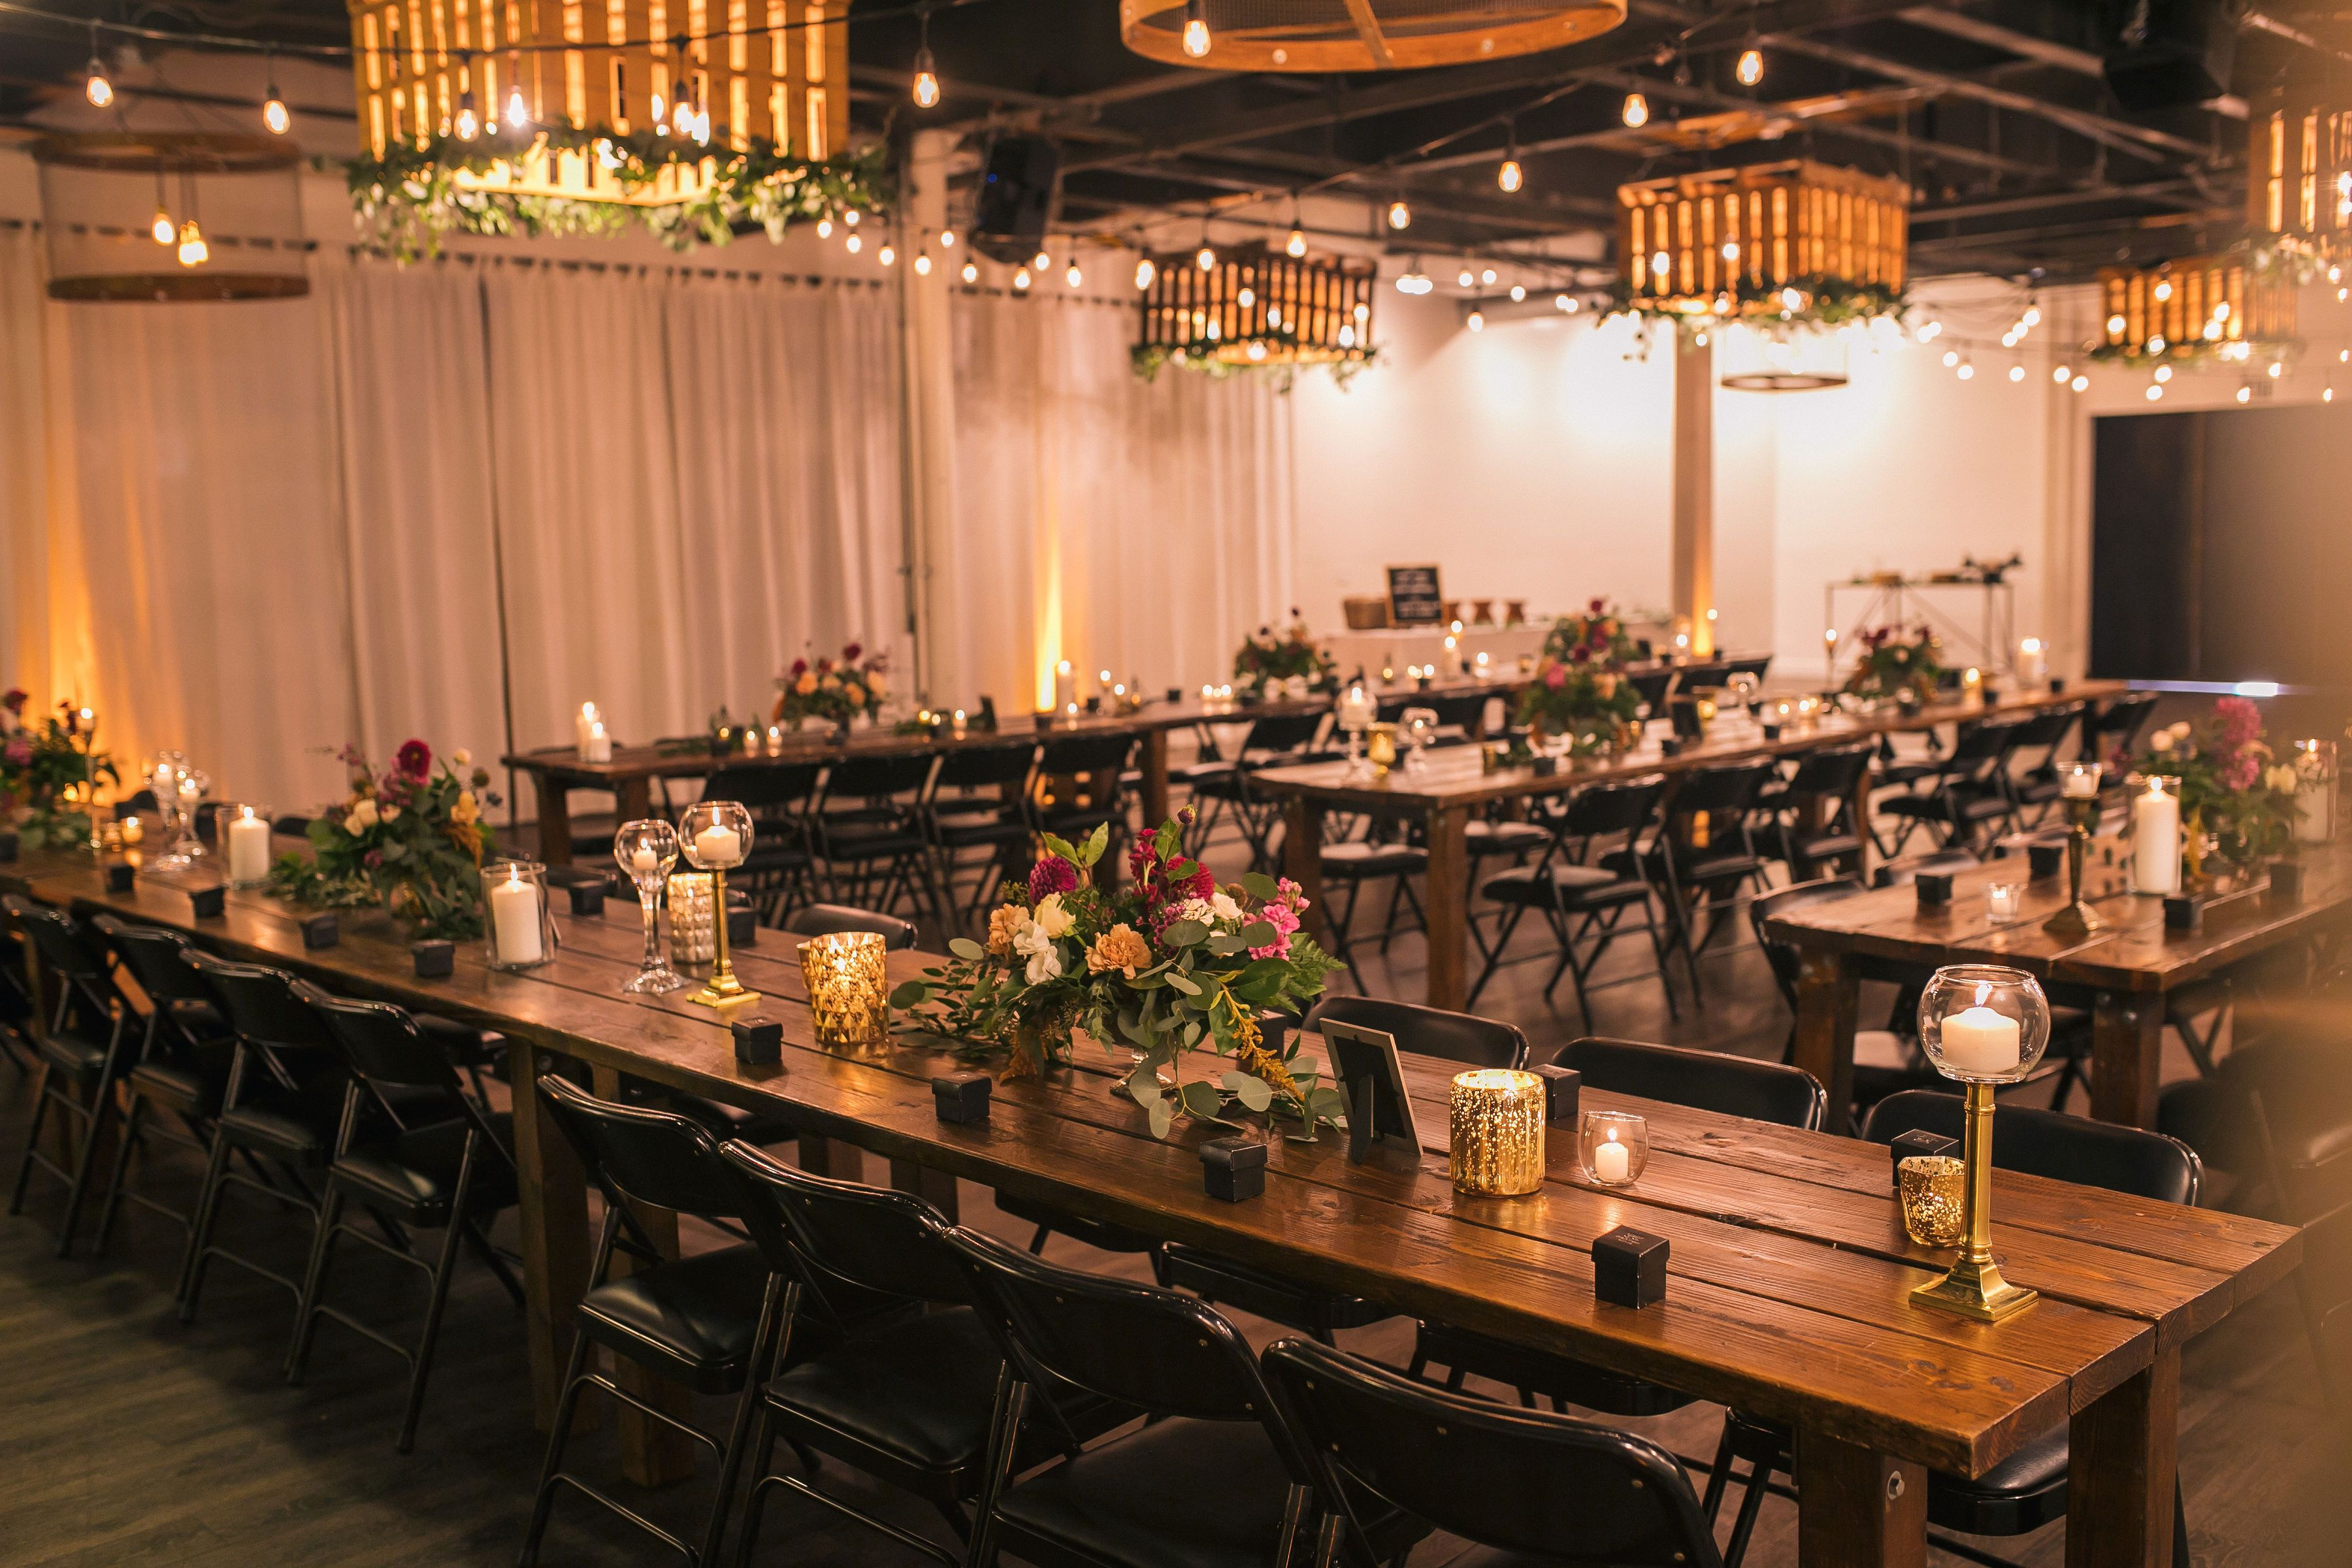 Farm Tables And More San Diego Table Rentals San Diego Wedding Rentals Southern California Wedding Rustic Table Decor Wedding Table Decorations Farm Table